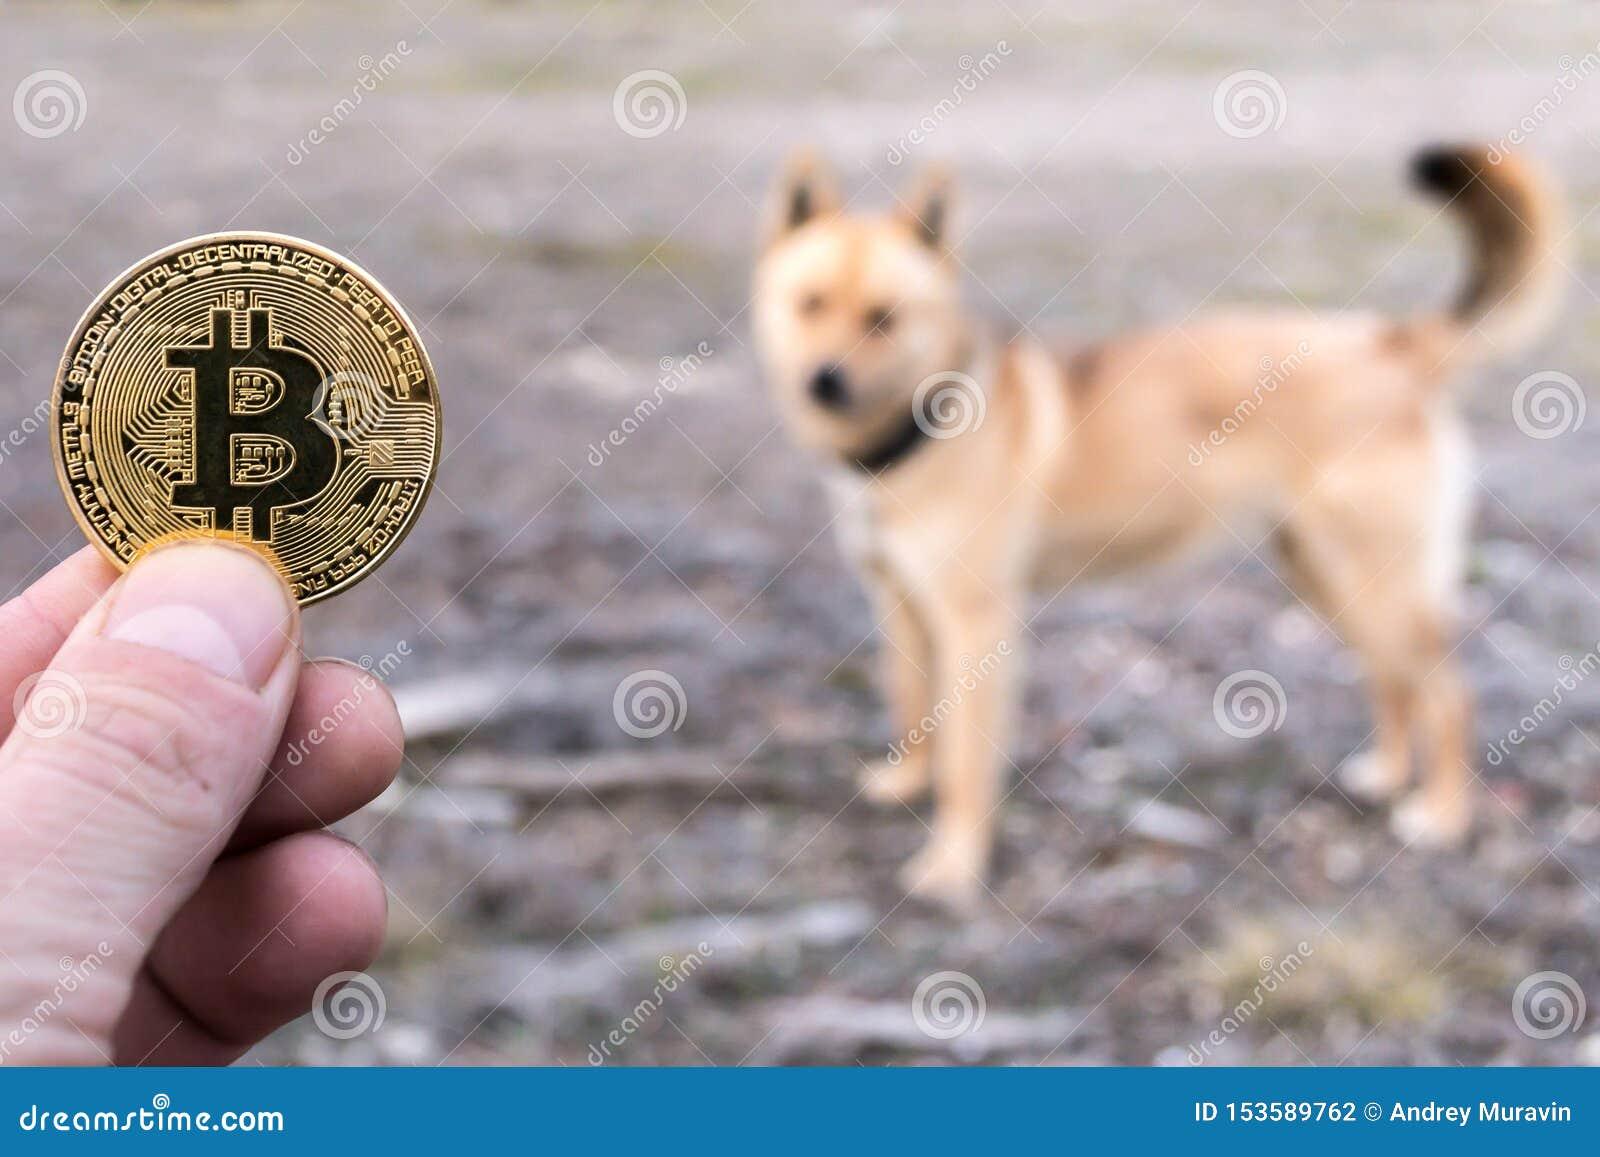 Convert dog coins to bitcoins mining kleinbettingen creche manhattan